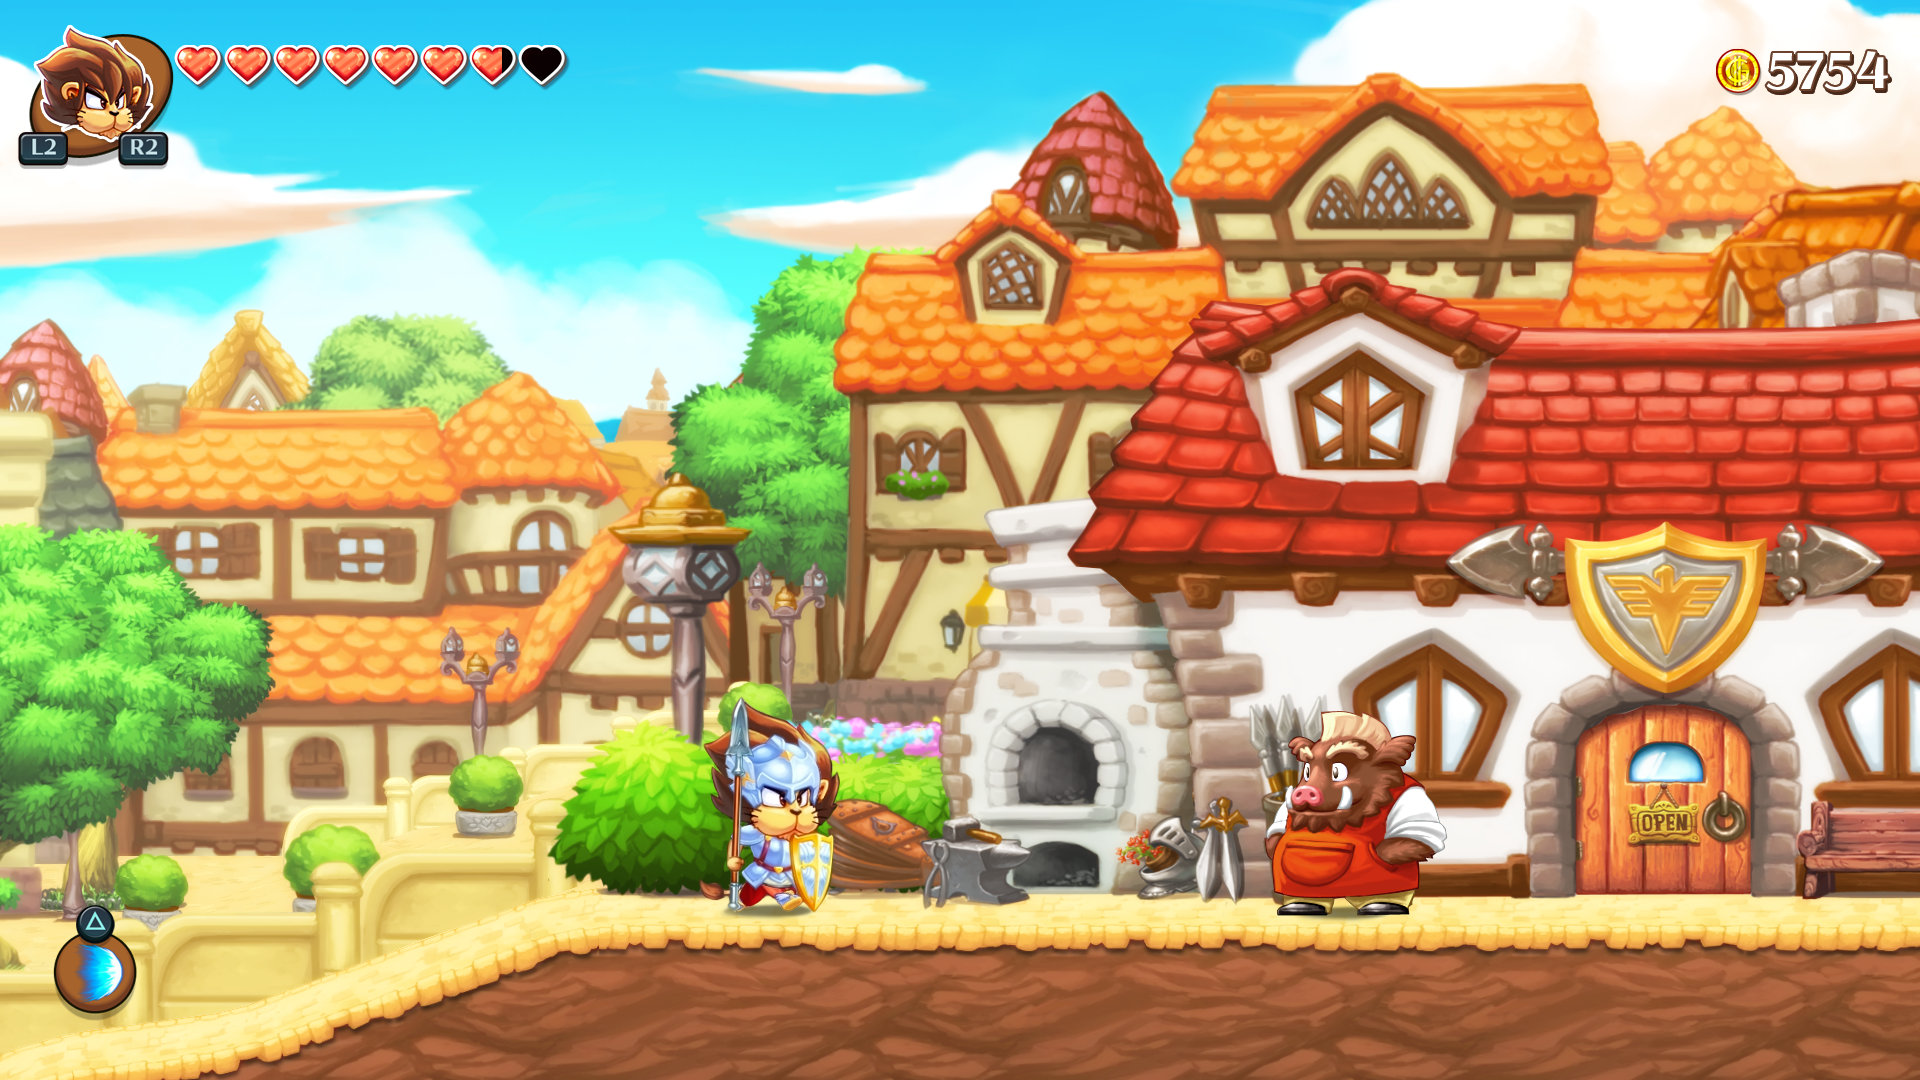 Nintendo Download: Monster Boy and the Cursed Kingdom screenshot